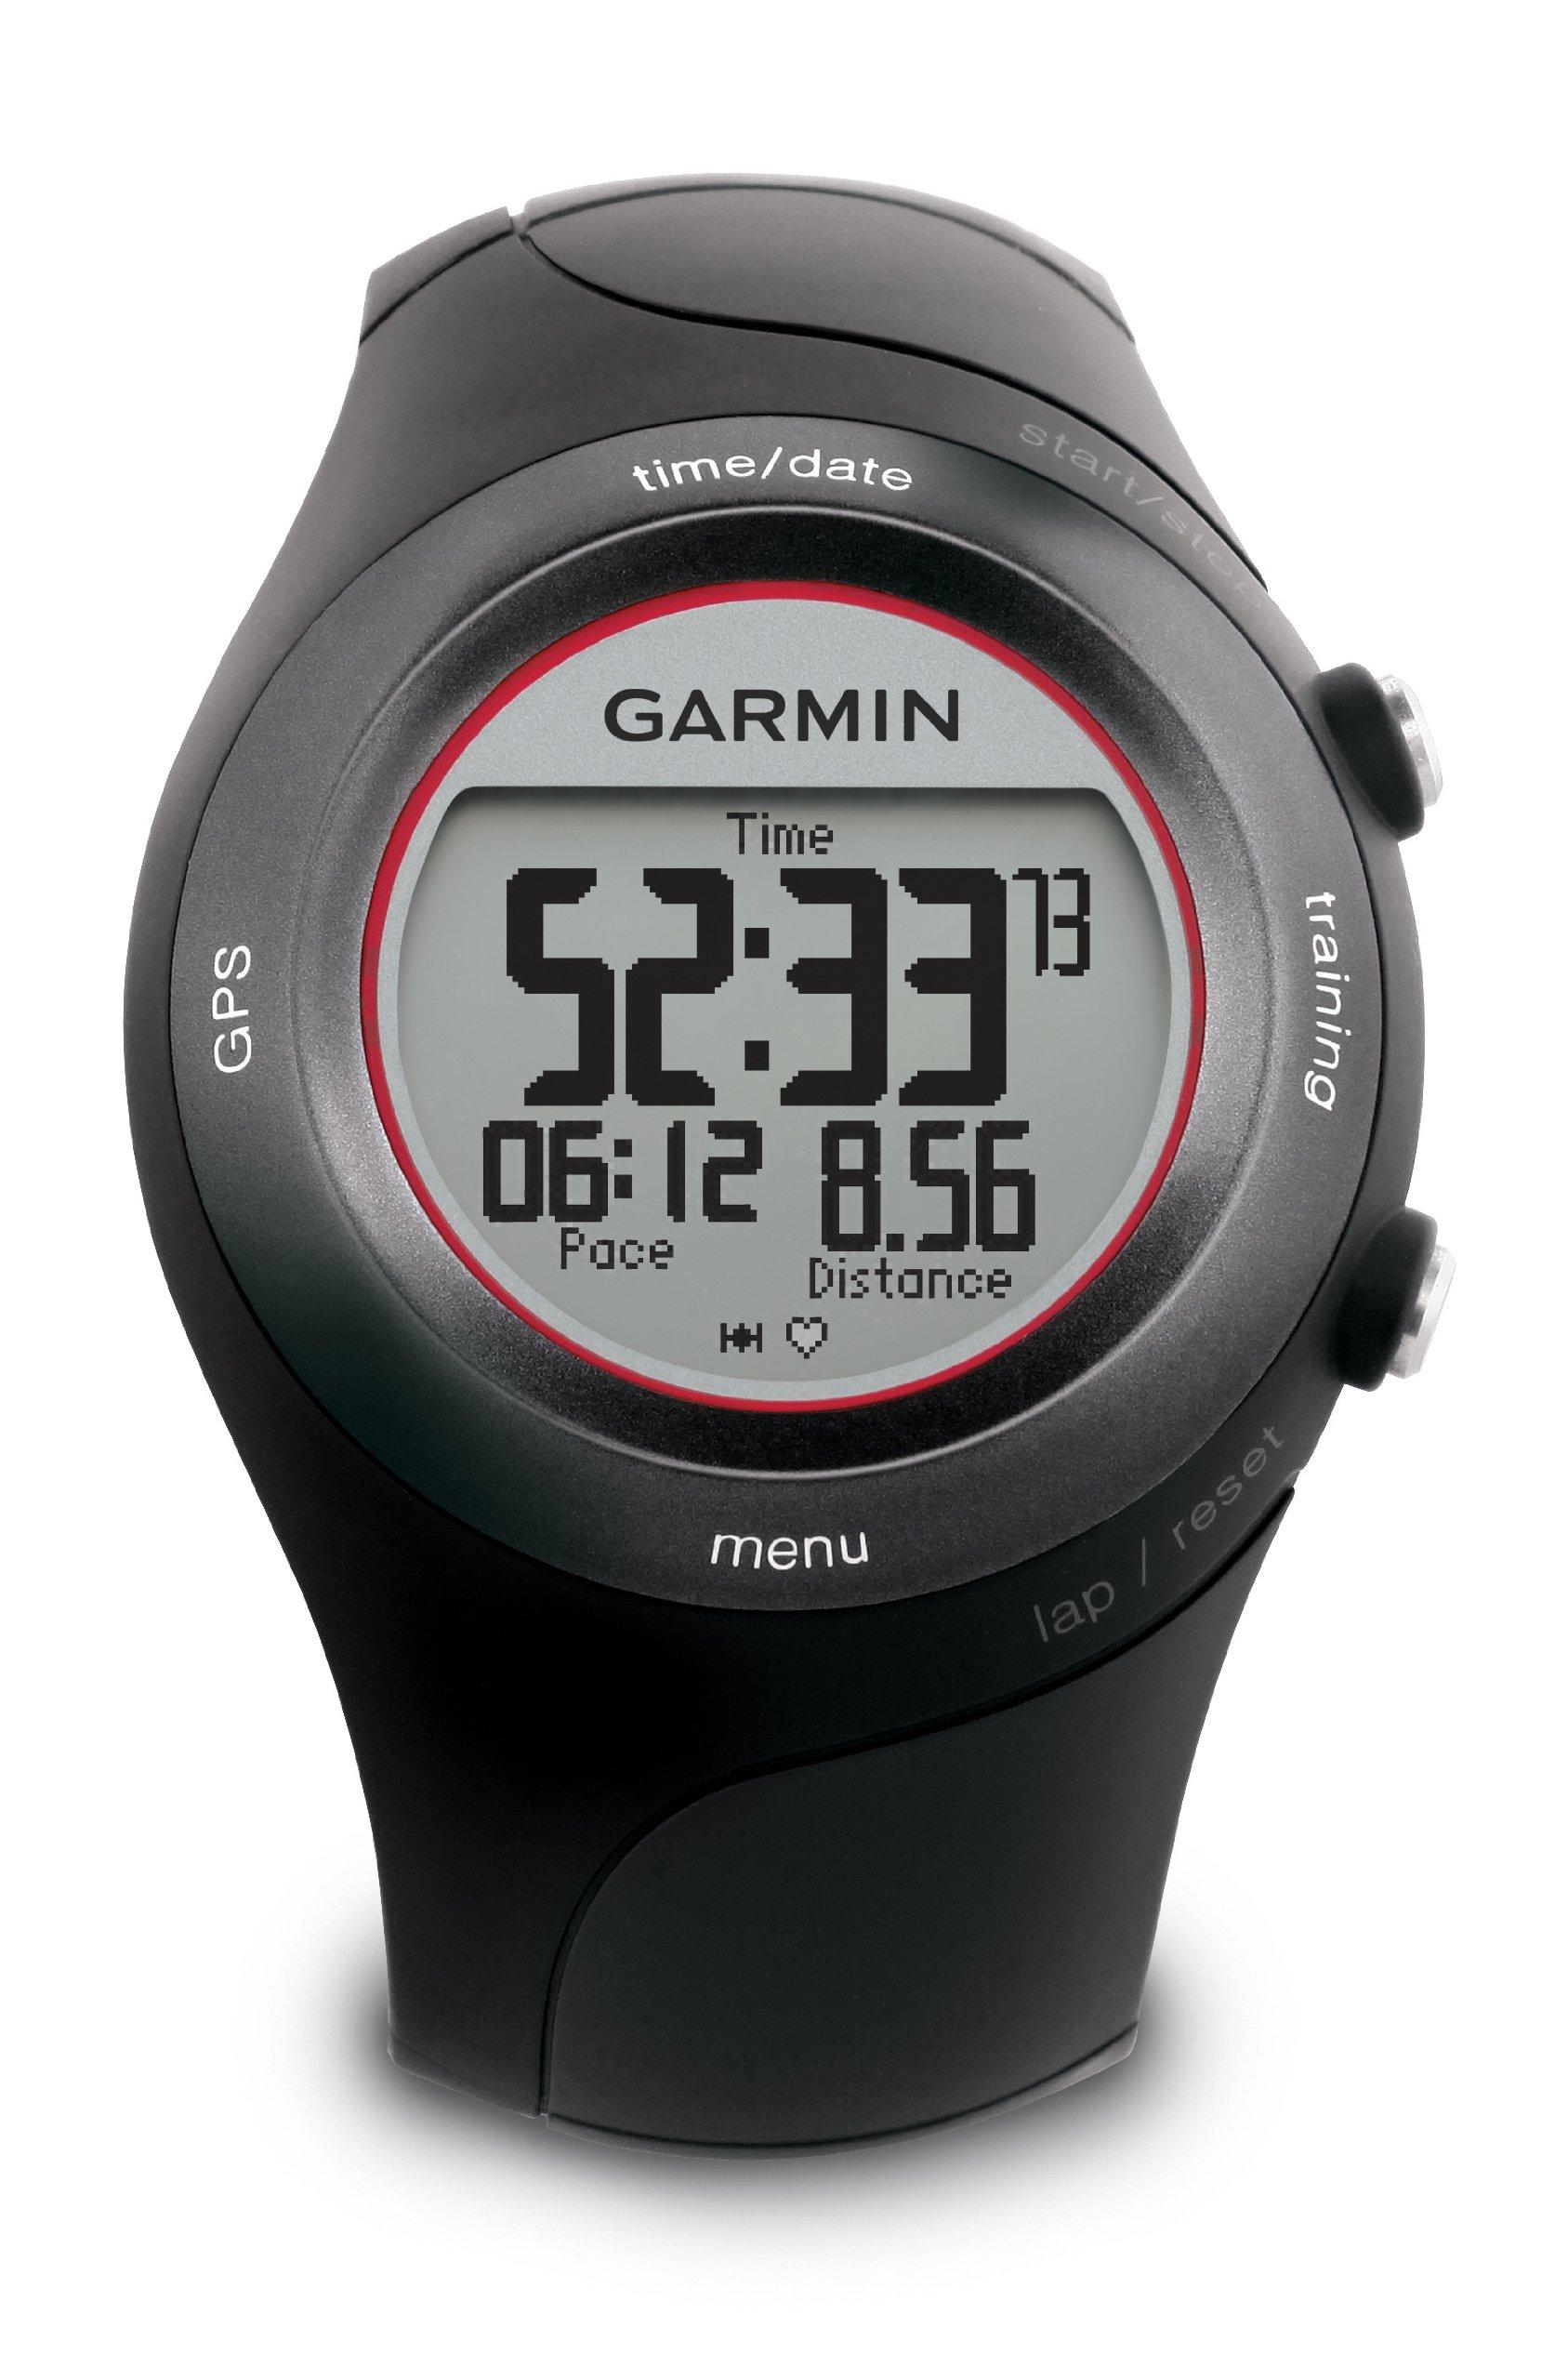 Garmin Forerunner 410 con fascia cardio, GPS product image